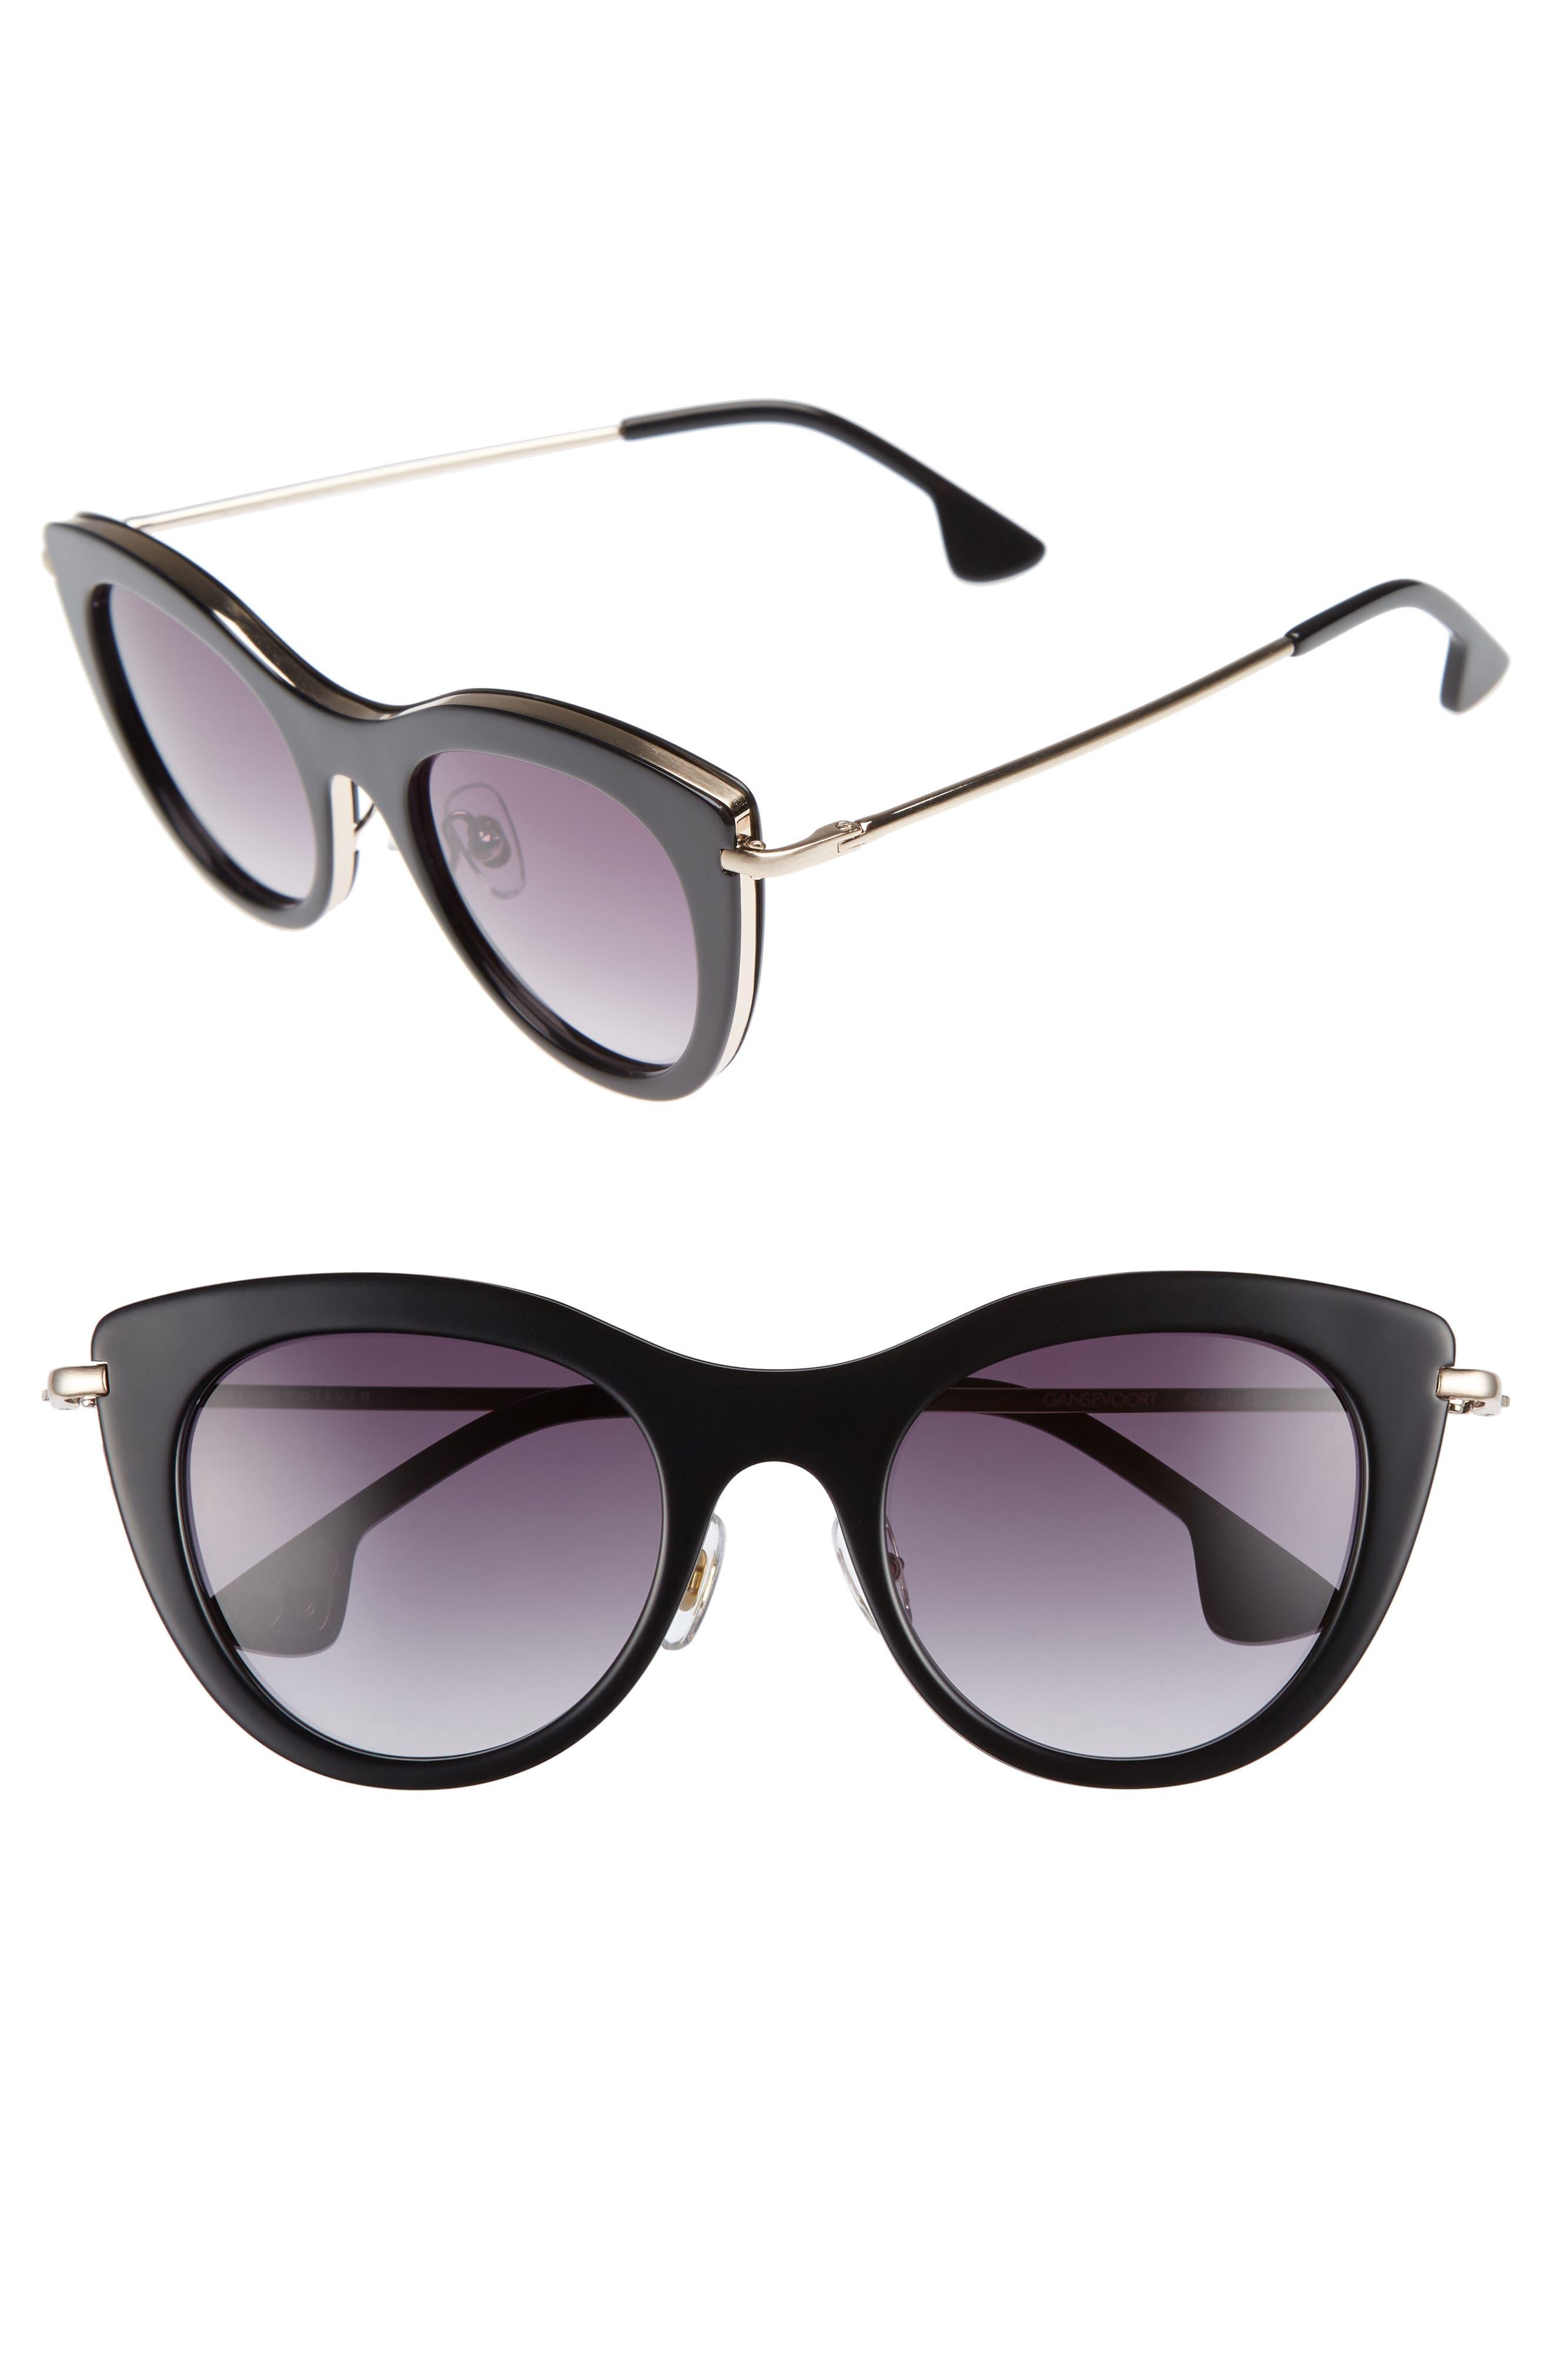 Alternate Image 1 Selected - Alice + Olivia Gansevoort 48mm Special Fit Cat Eye Sunglasses